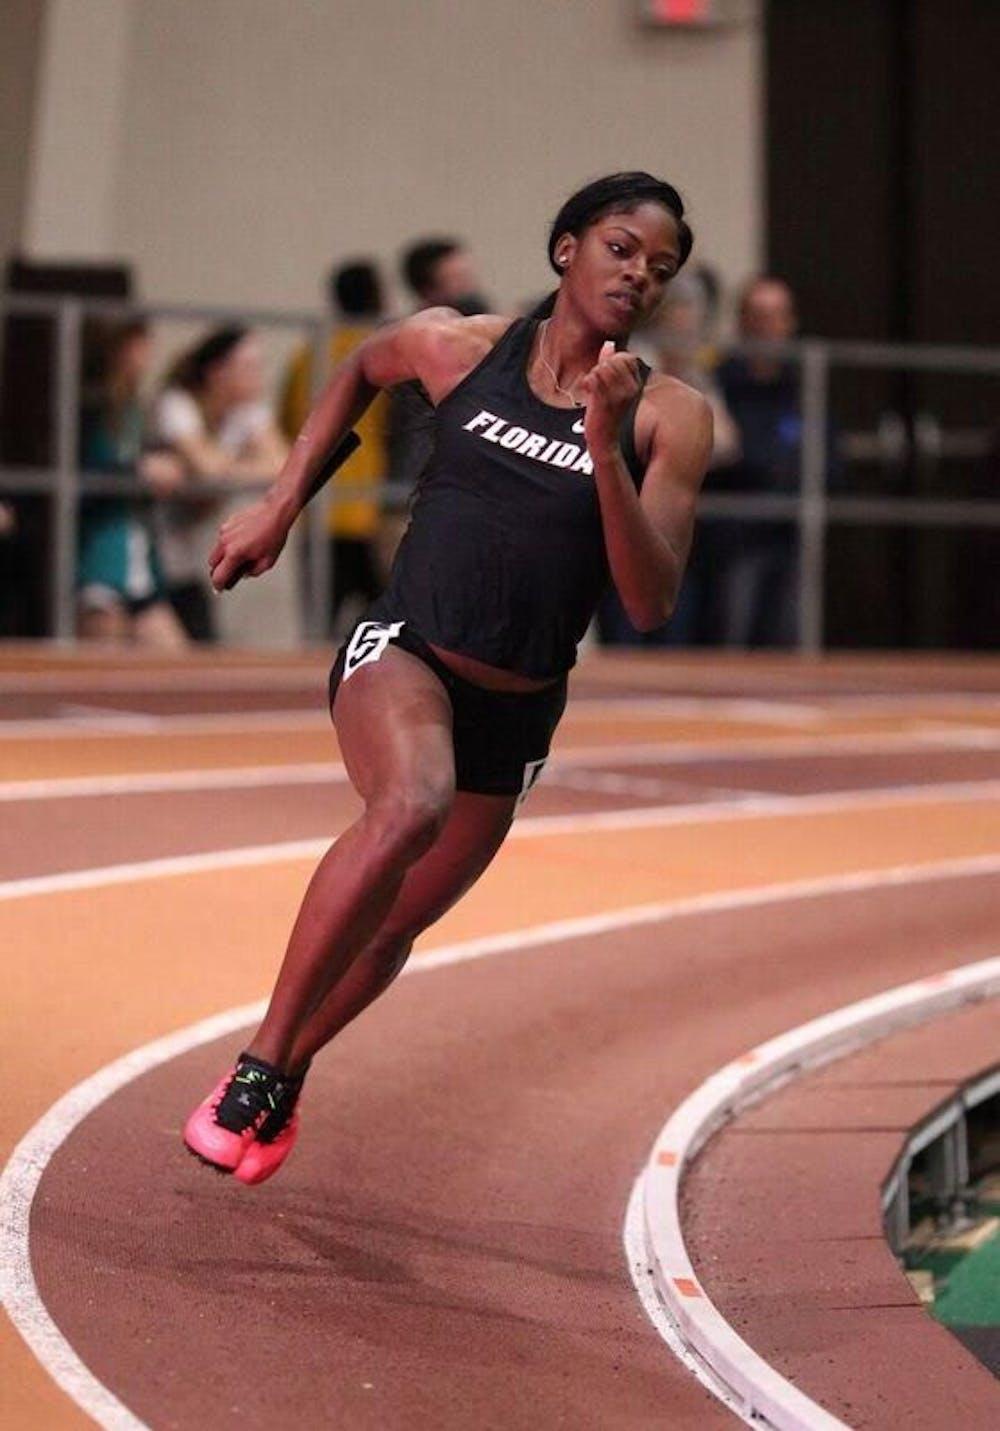 <p>UF sprinter Sharrika Barnett sprints at the Hokie Invitational on Jan. 21, 2017, in Blacksburg, Virgina.&nbsp;</p>